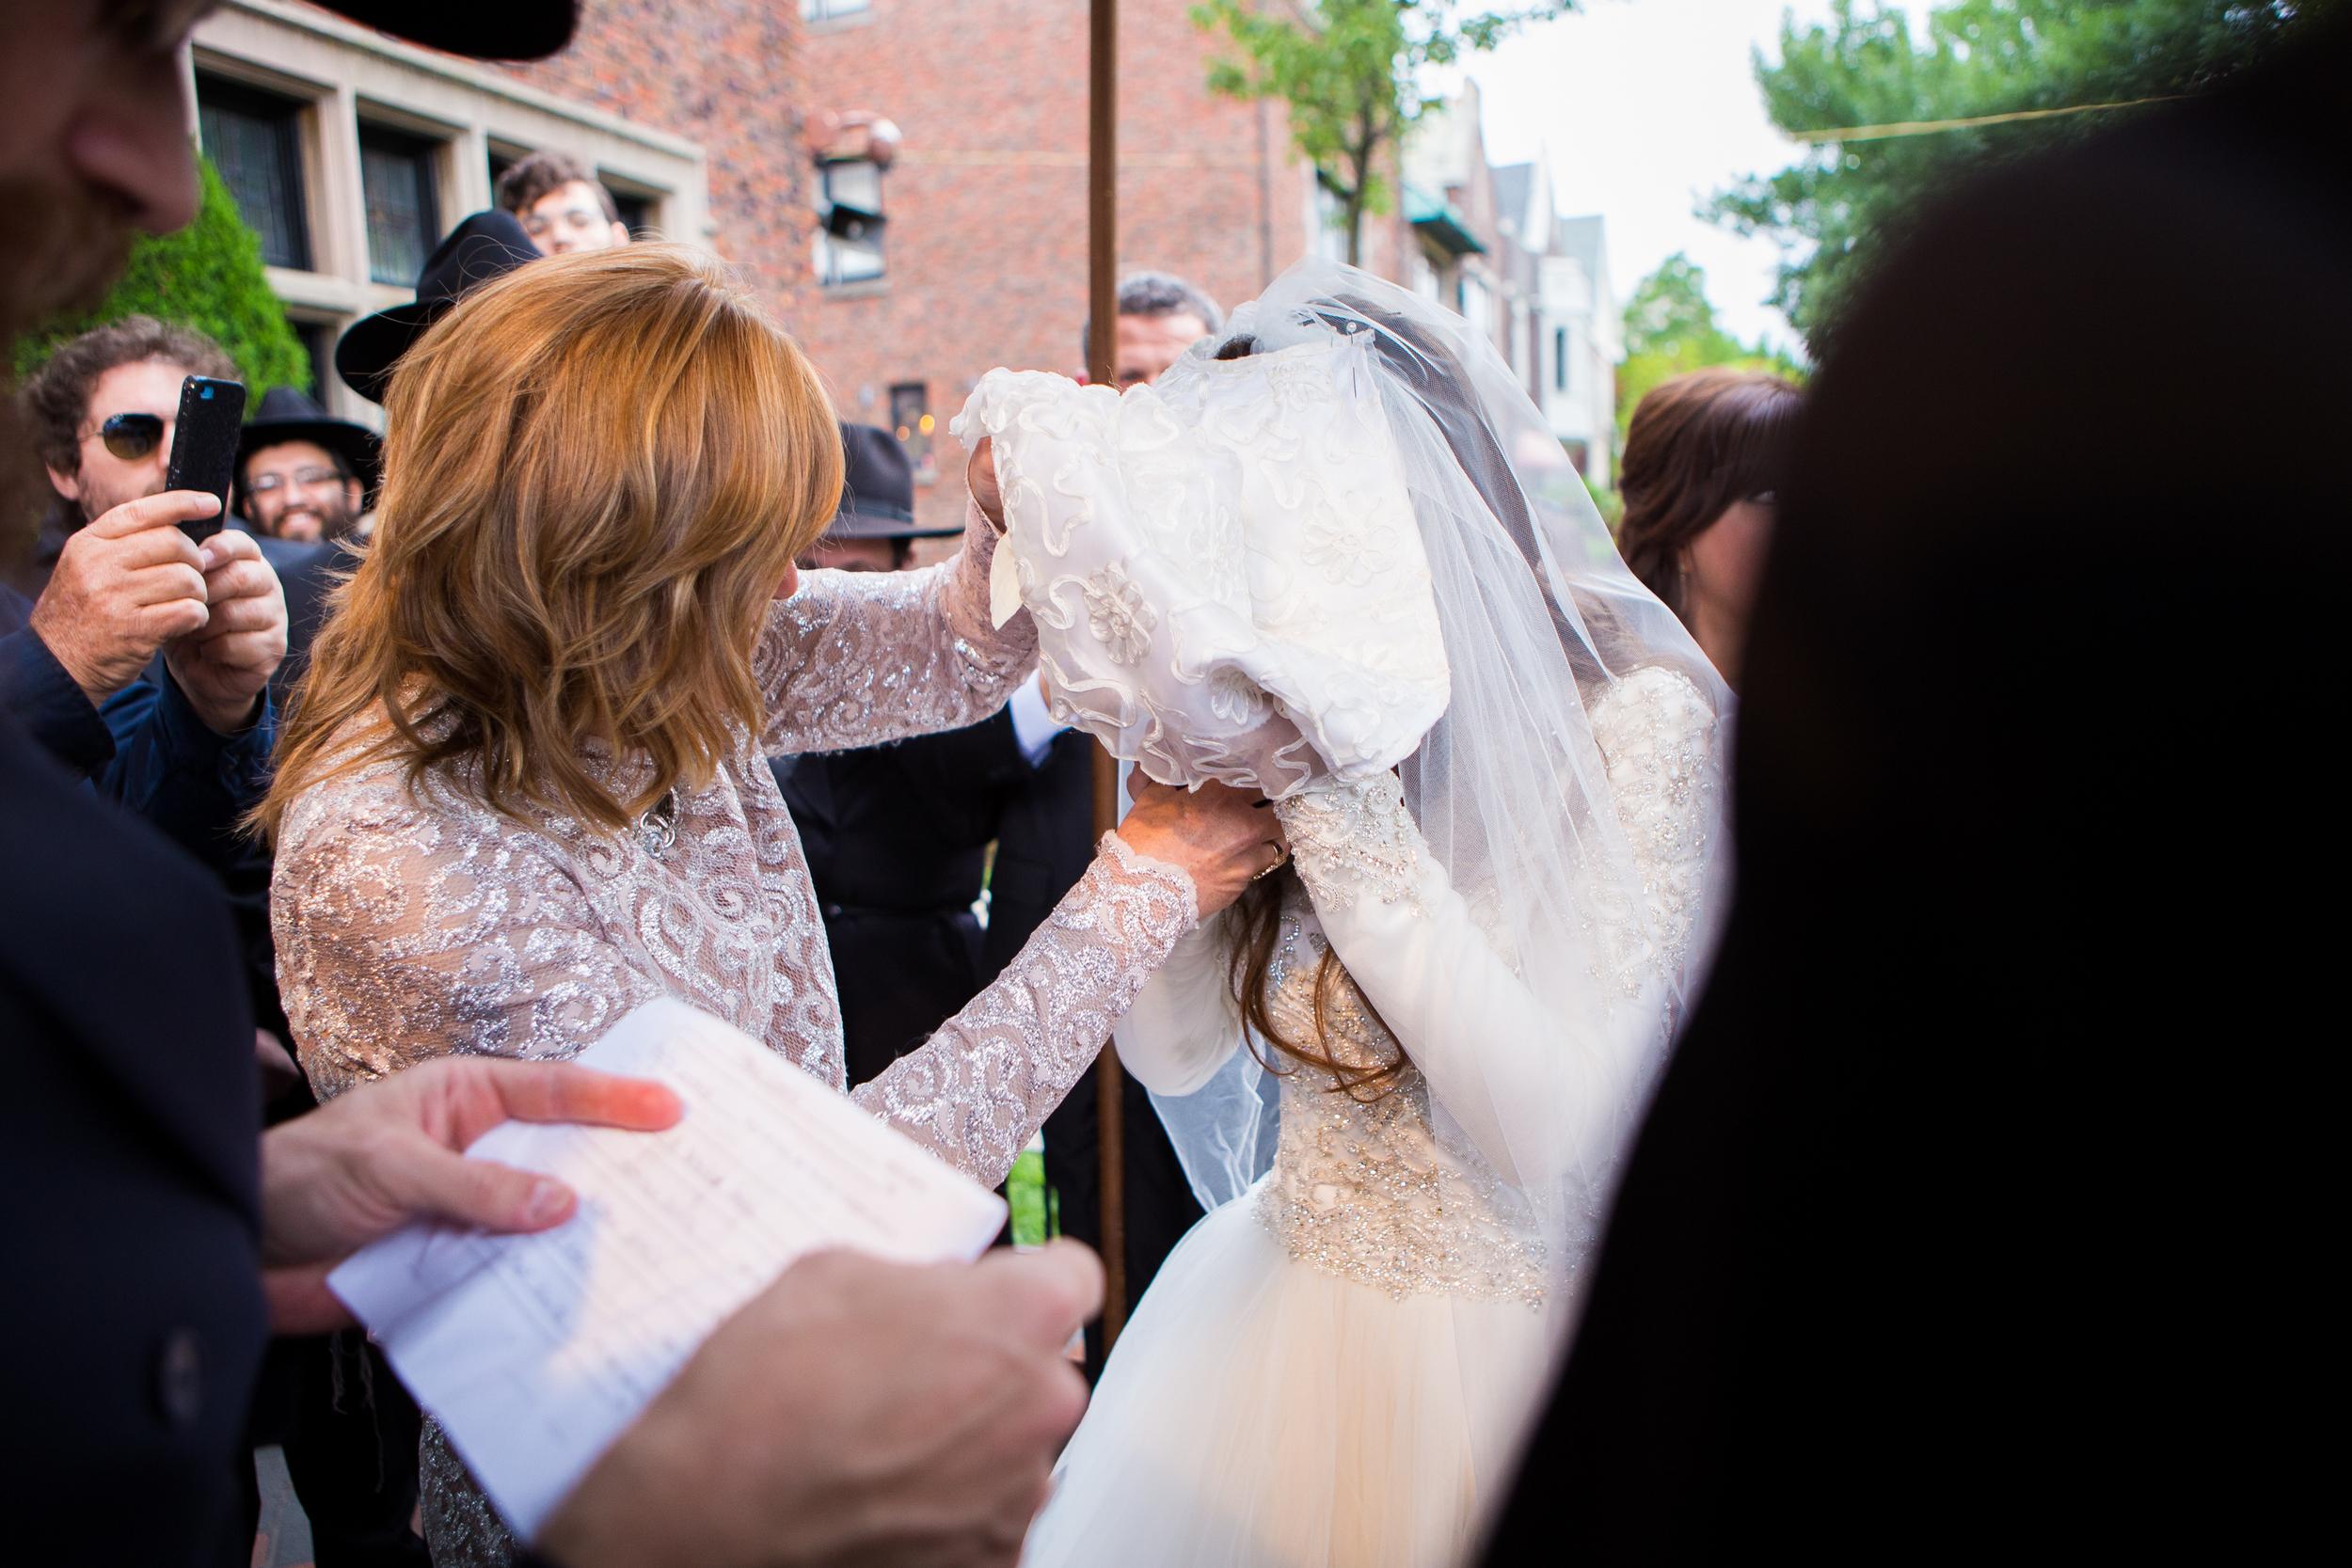 Wedding Iossi and Gitty Khafif  - Eliau Piha studio photography, new york, events, people 770 brooklyn -0456.jpg